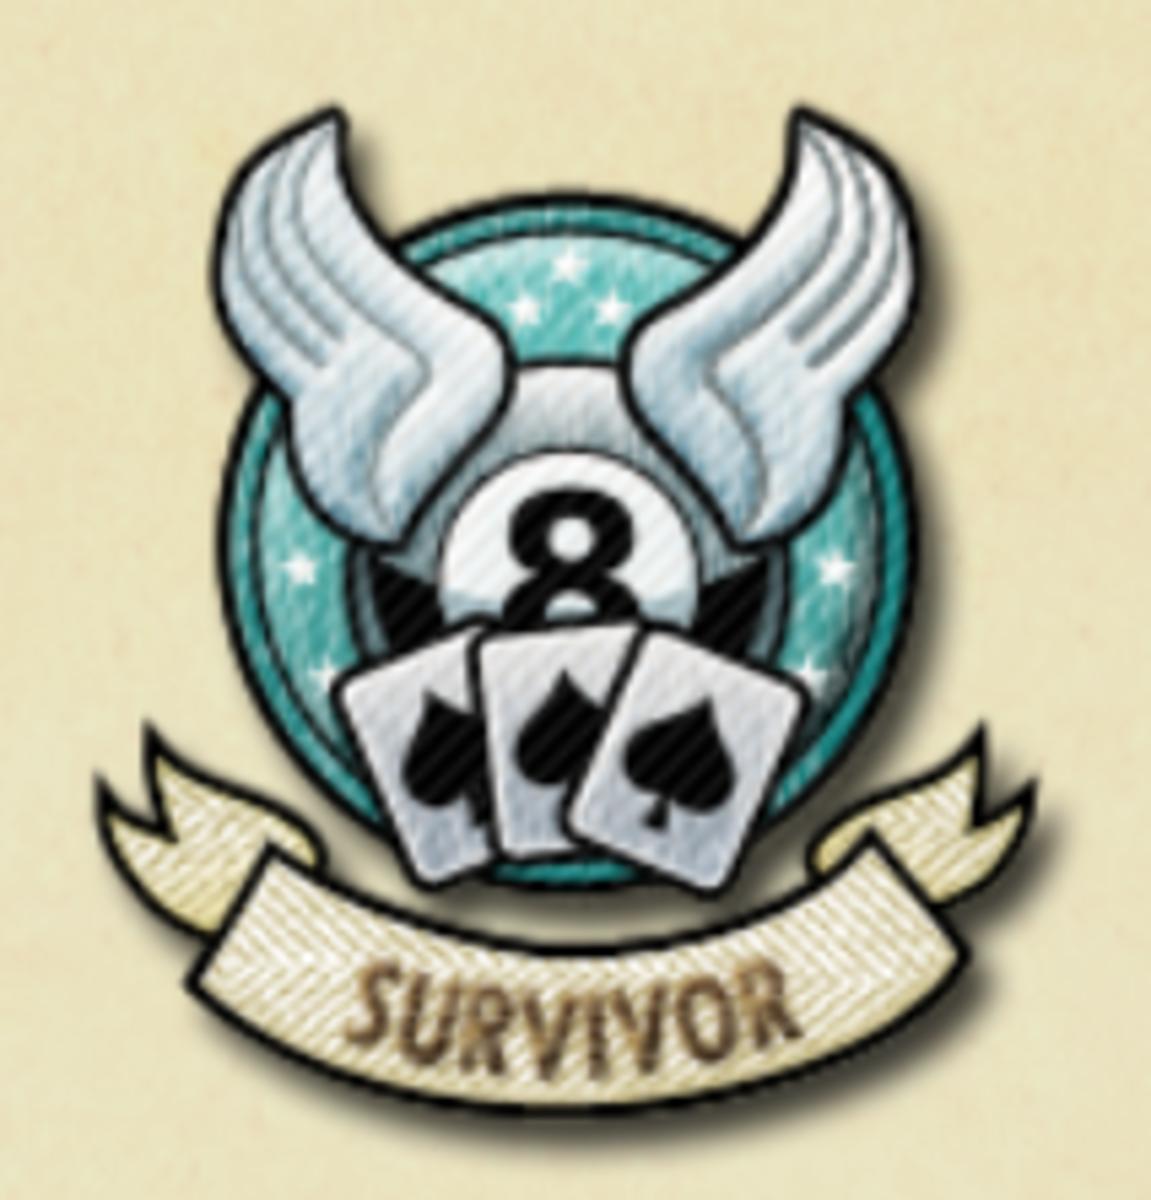 Survivor Medal